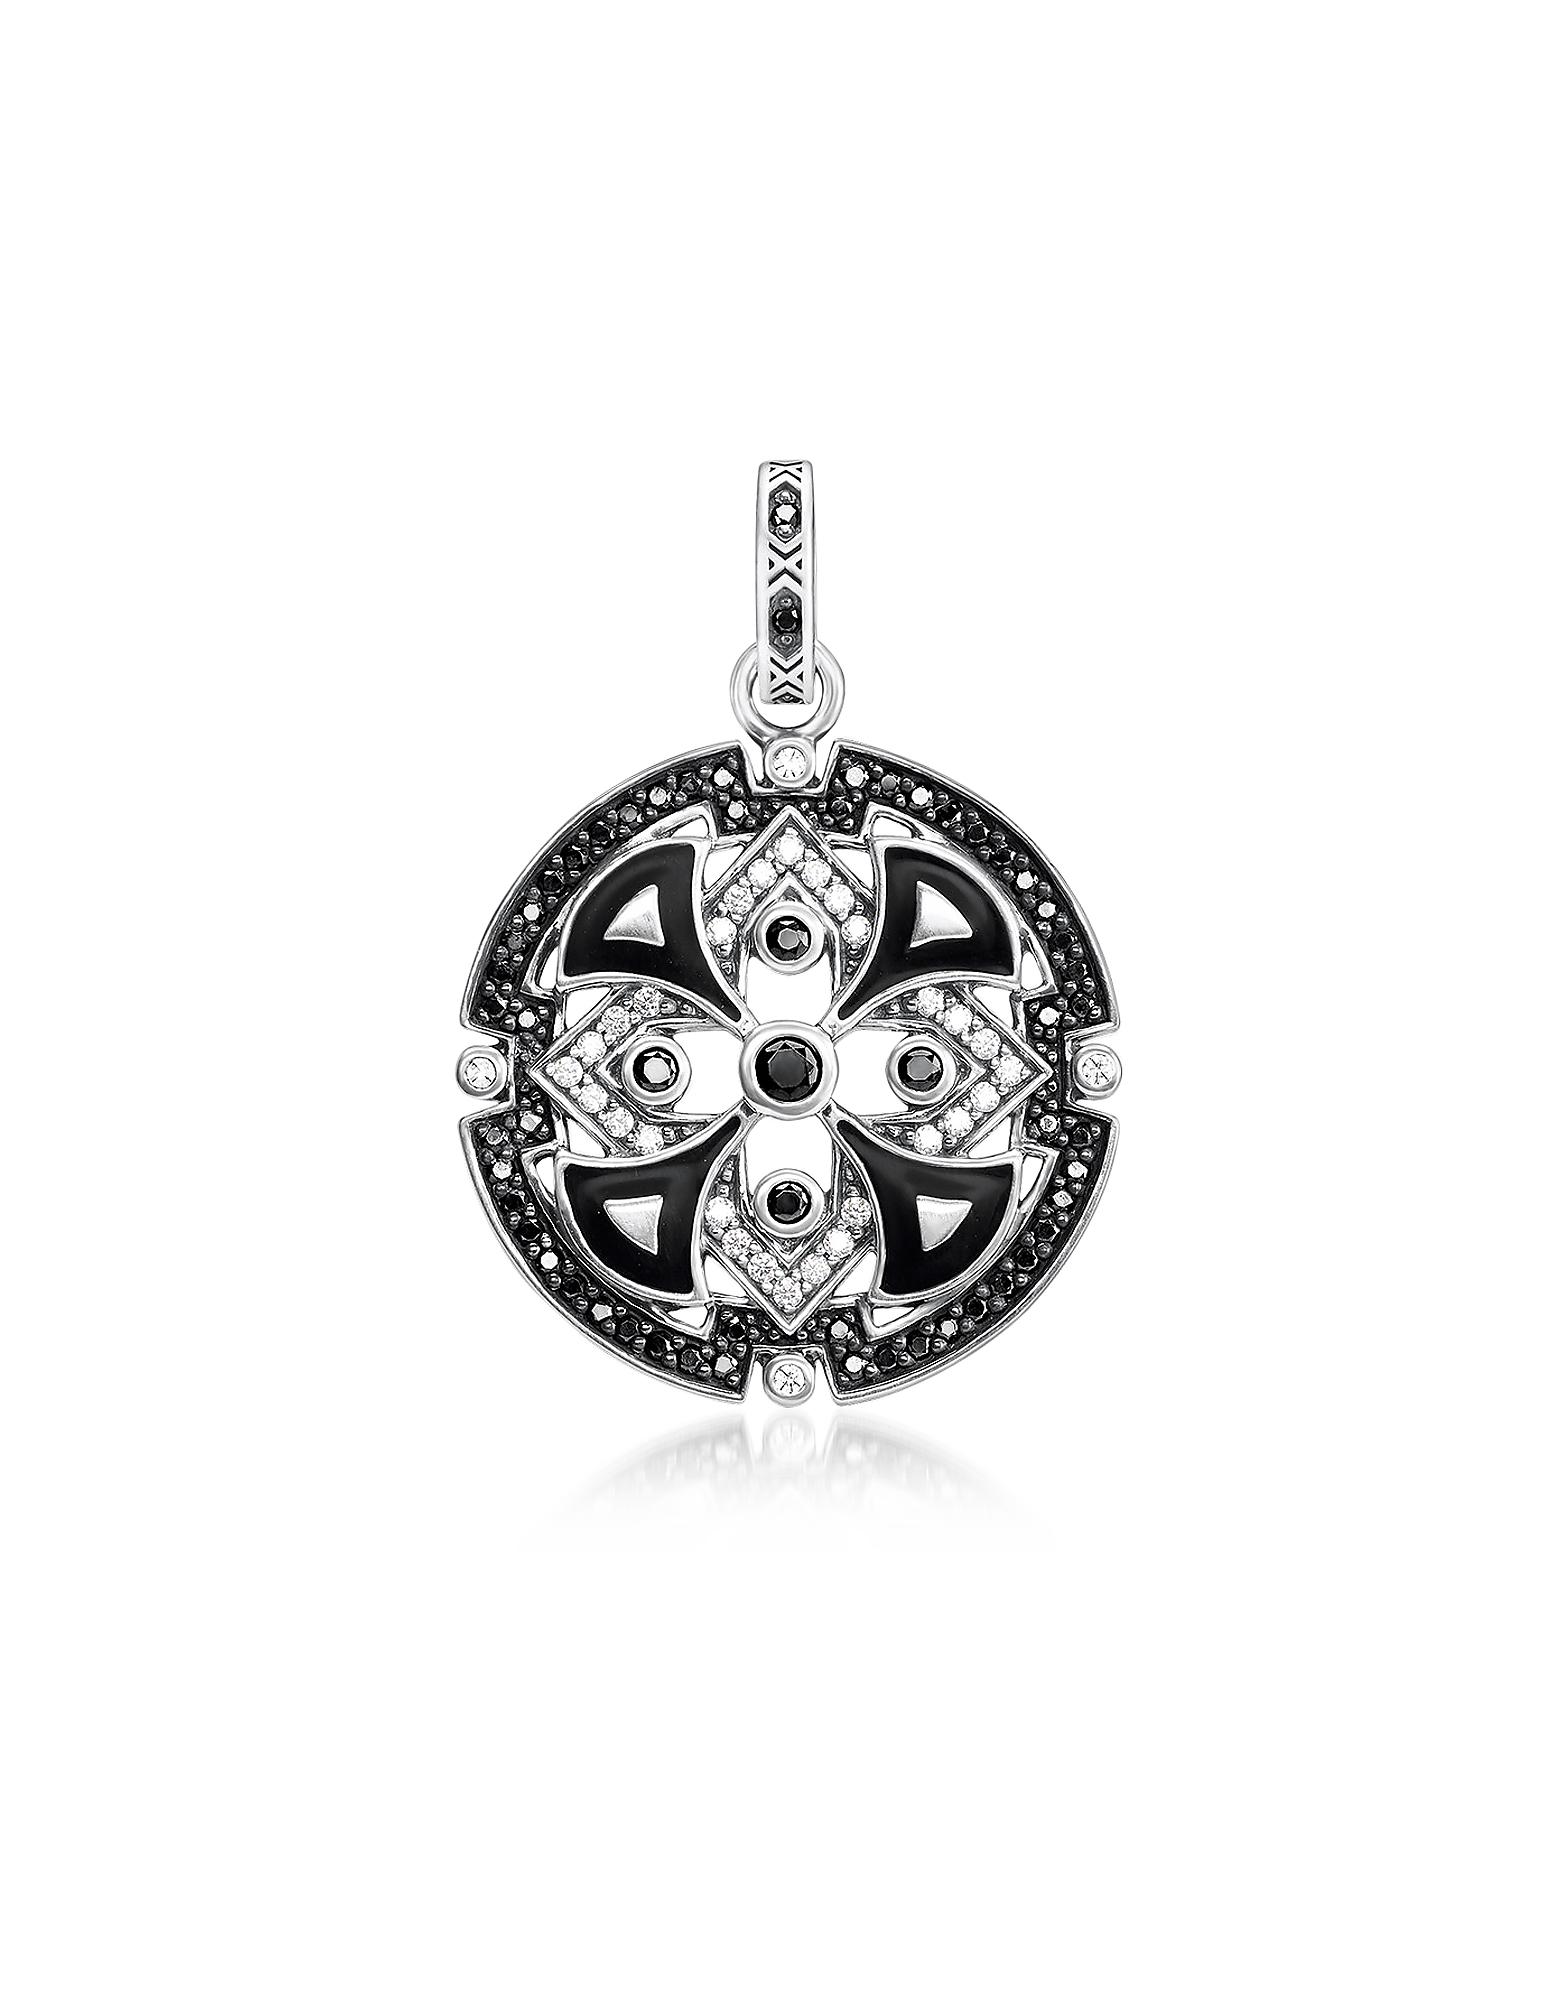 Blackened Sterling Silver w/Black & White Cubic Zirconia Pendant